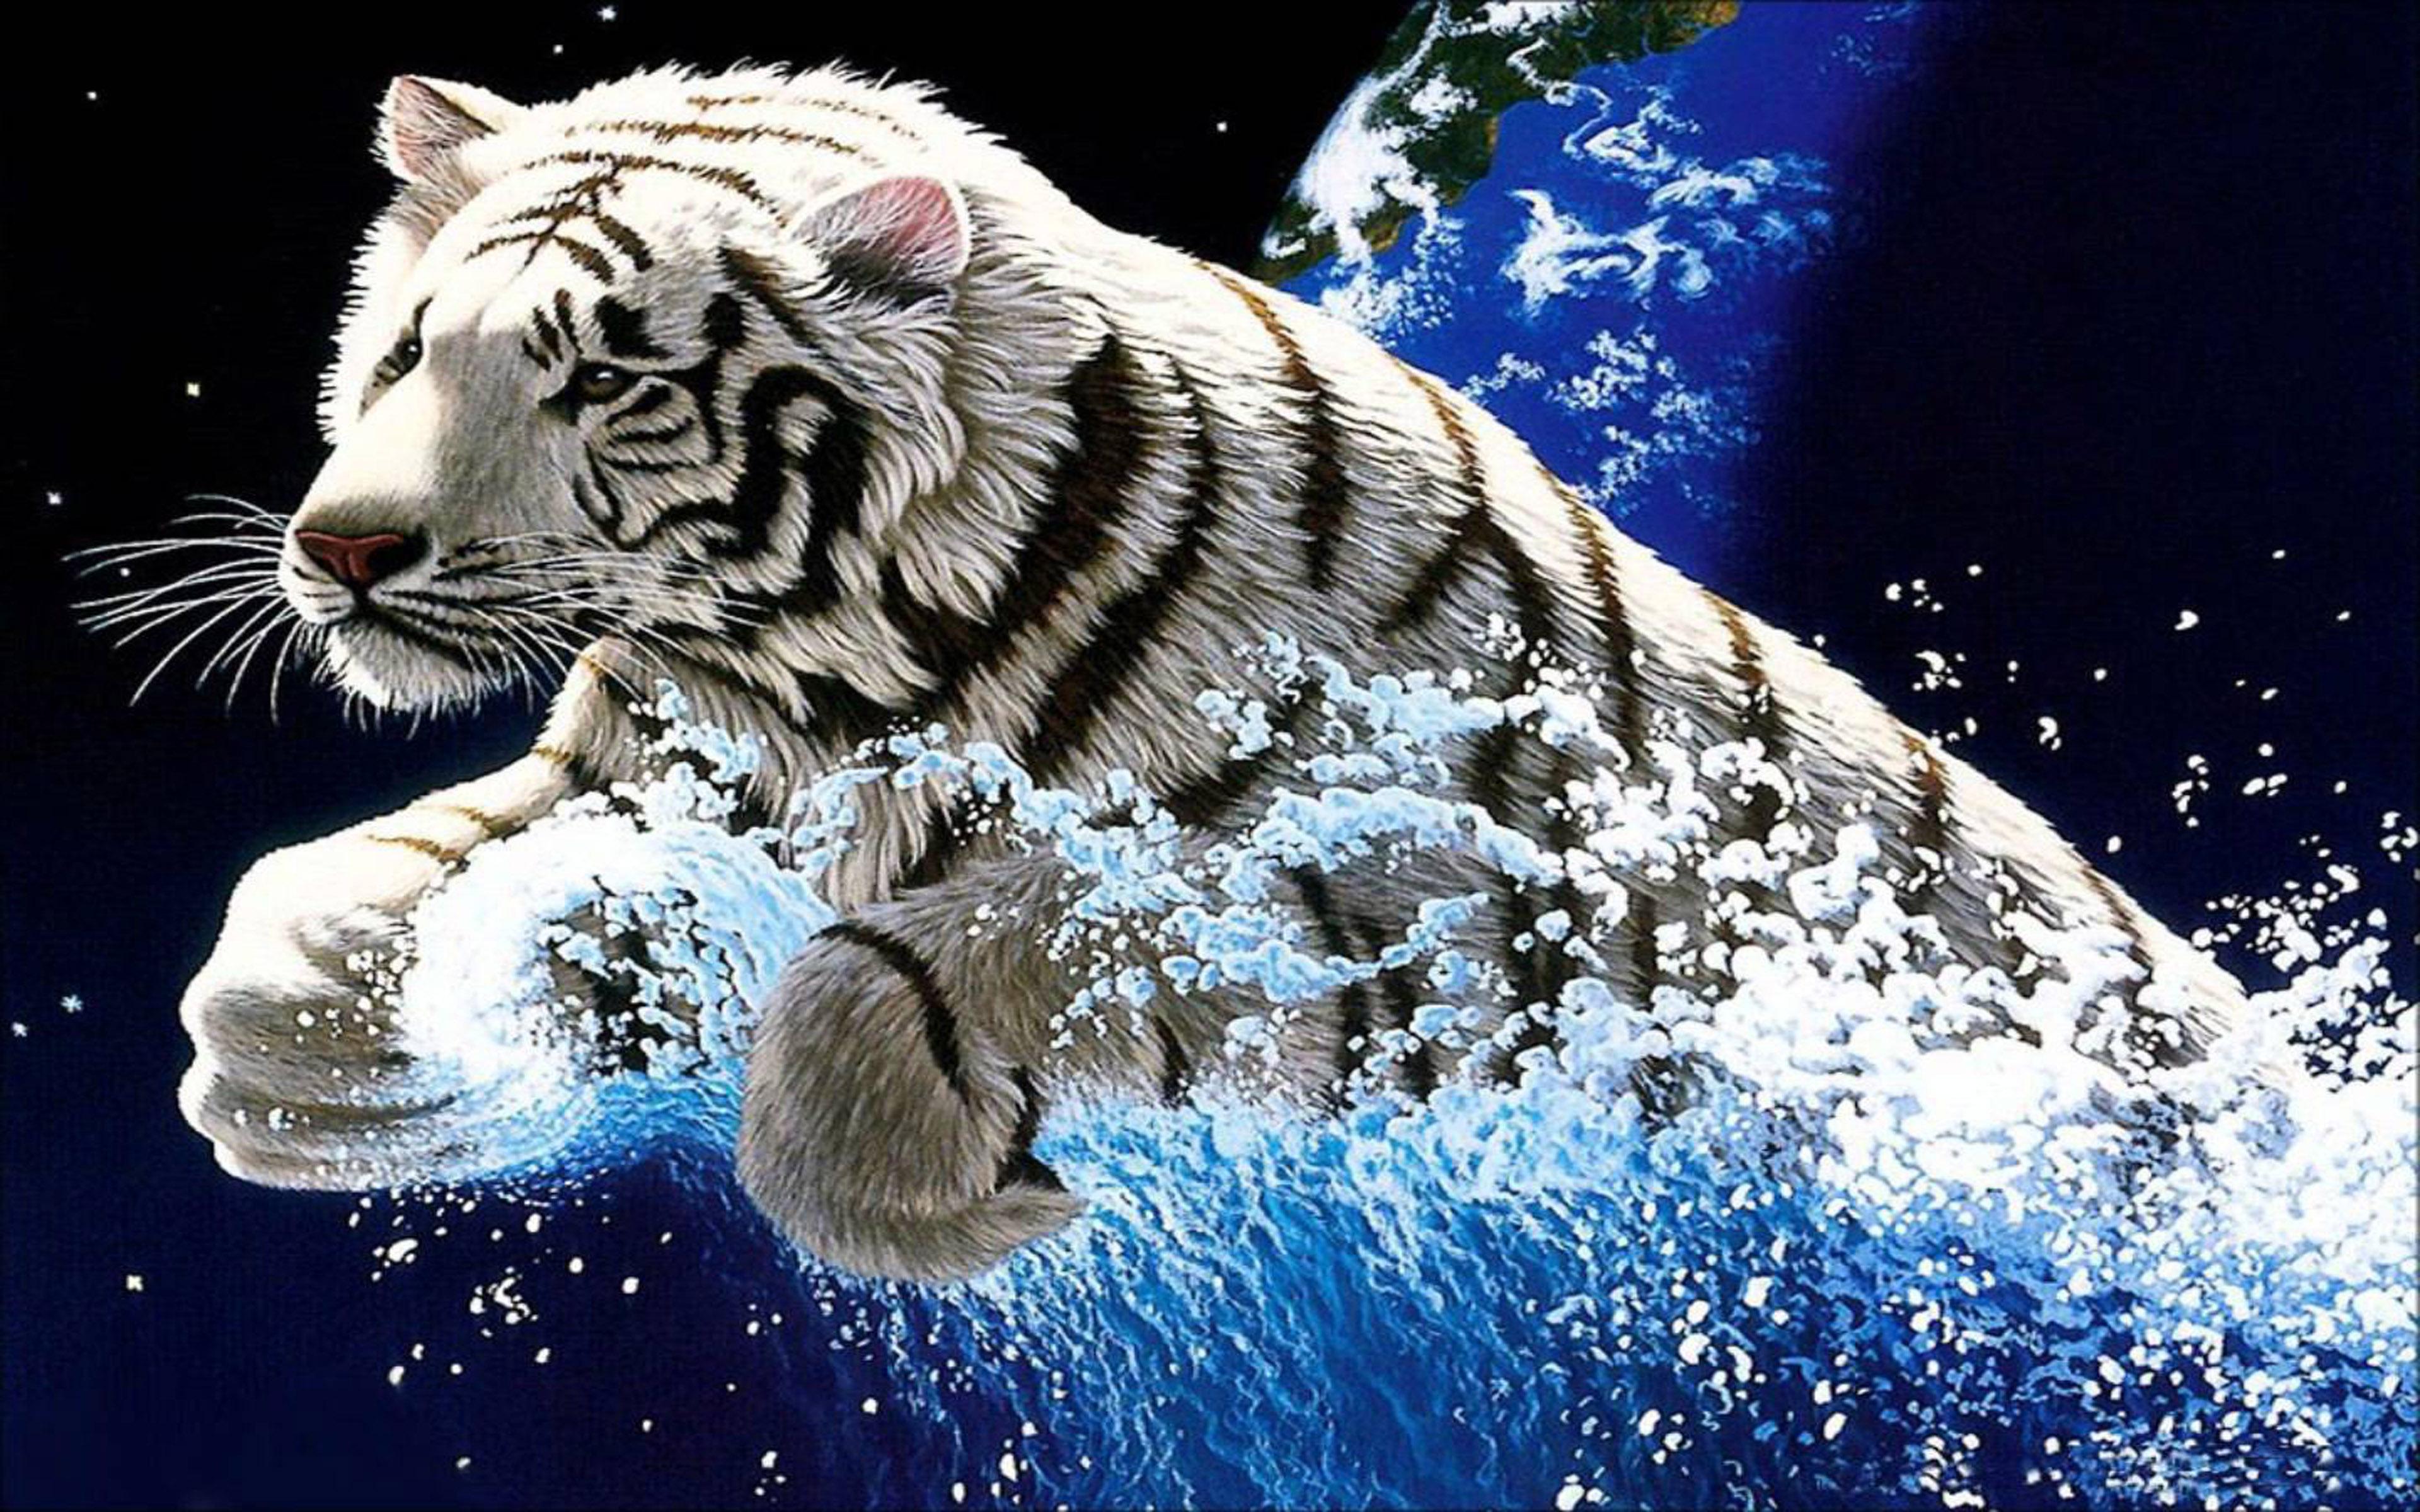 Fantasy Tiger Hd Desktop Wallpapers Widescreen High: High Definition Water Wallpapers